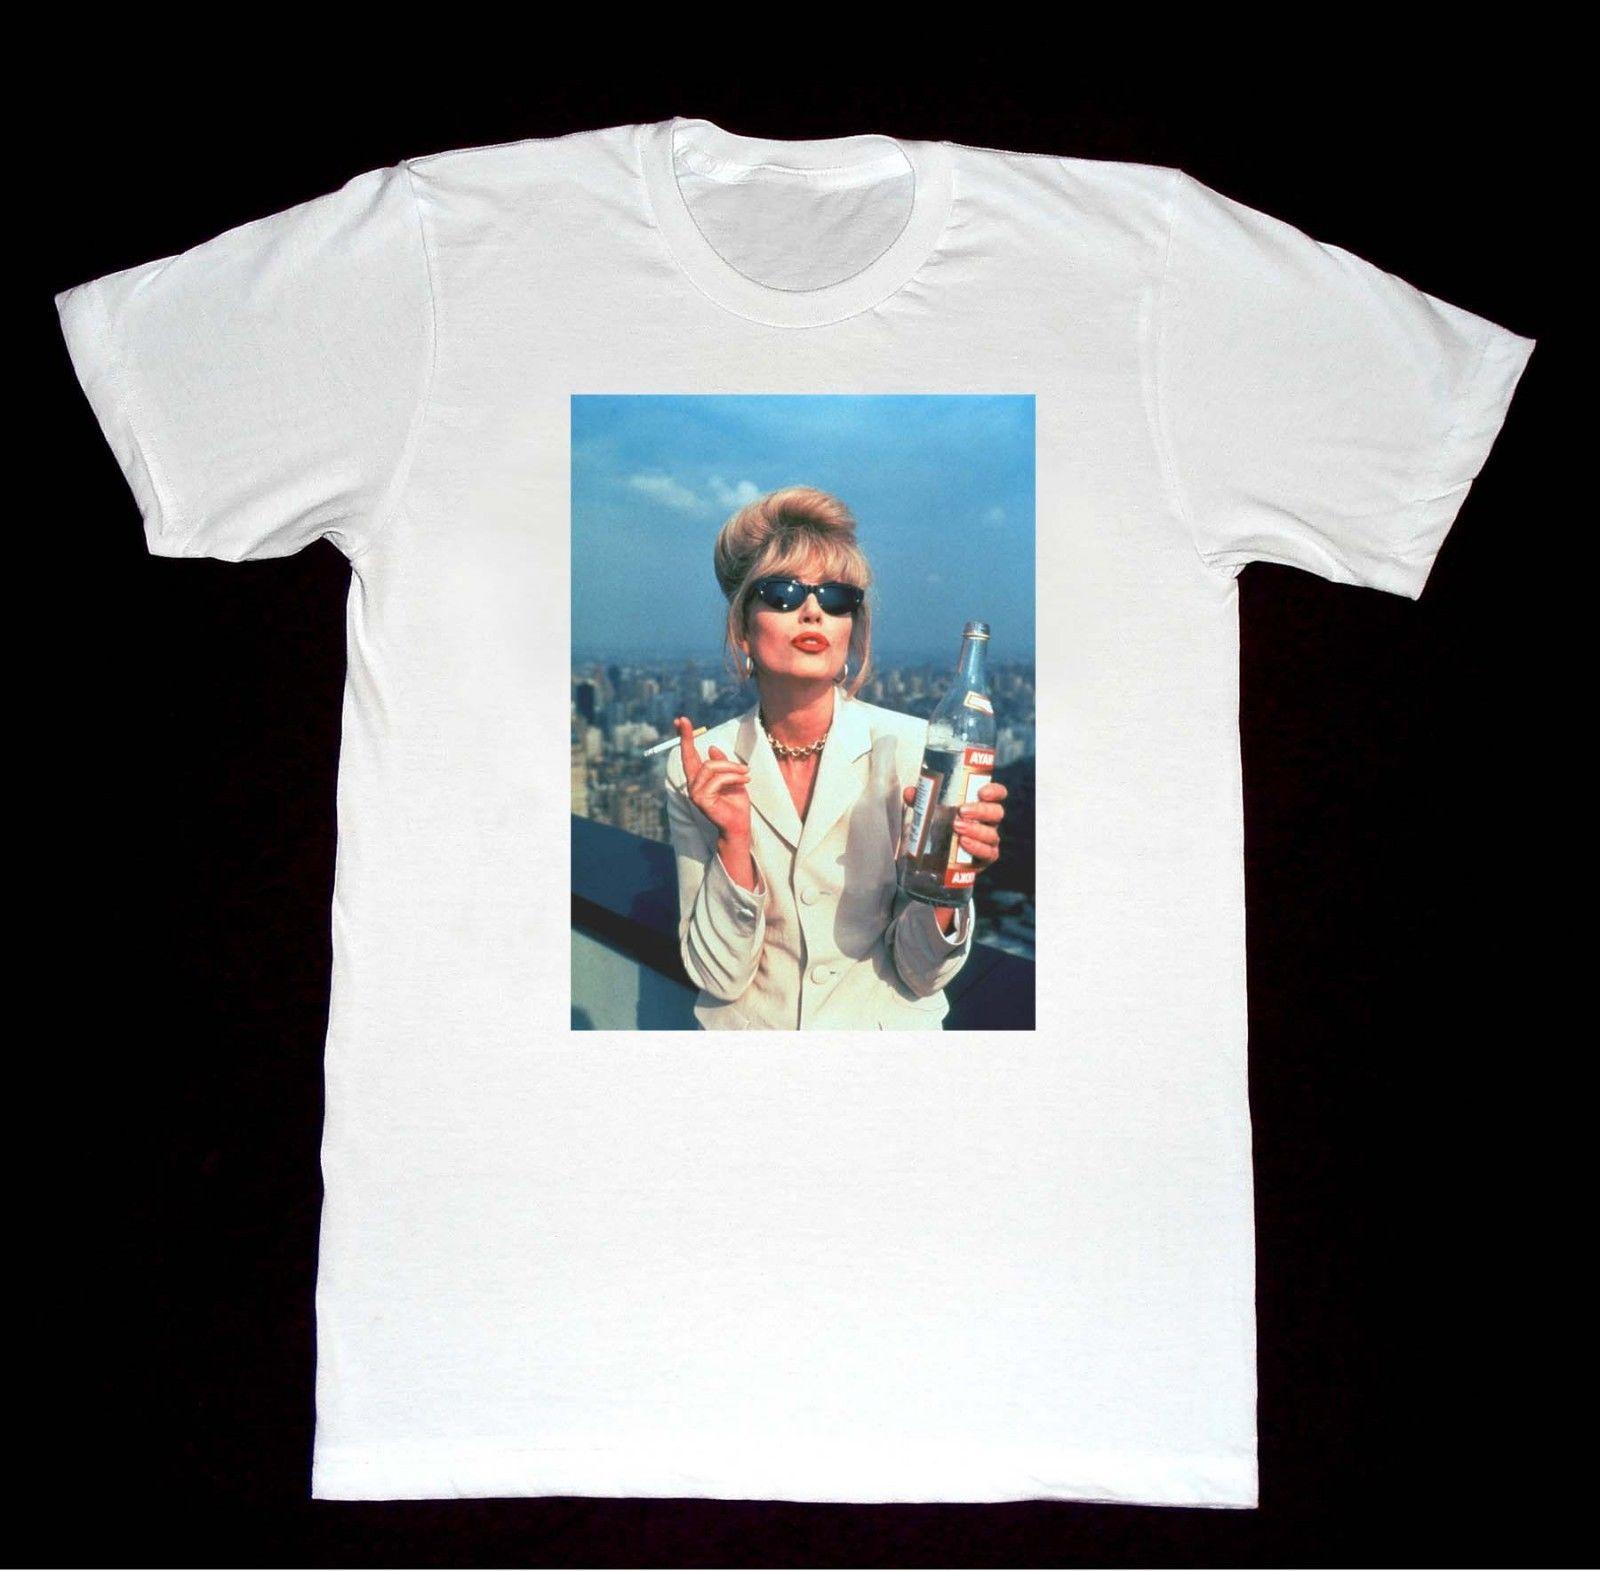 Absolutamente fabuloso t camisa 8 camisa patsy alcoólico moda lgbt vodka 3d camiseta masculina plus size algodão topos t anime